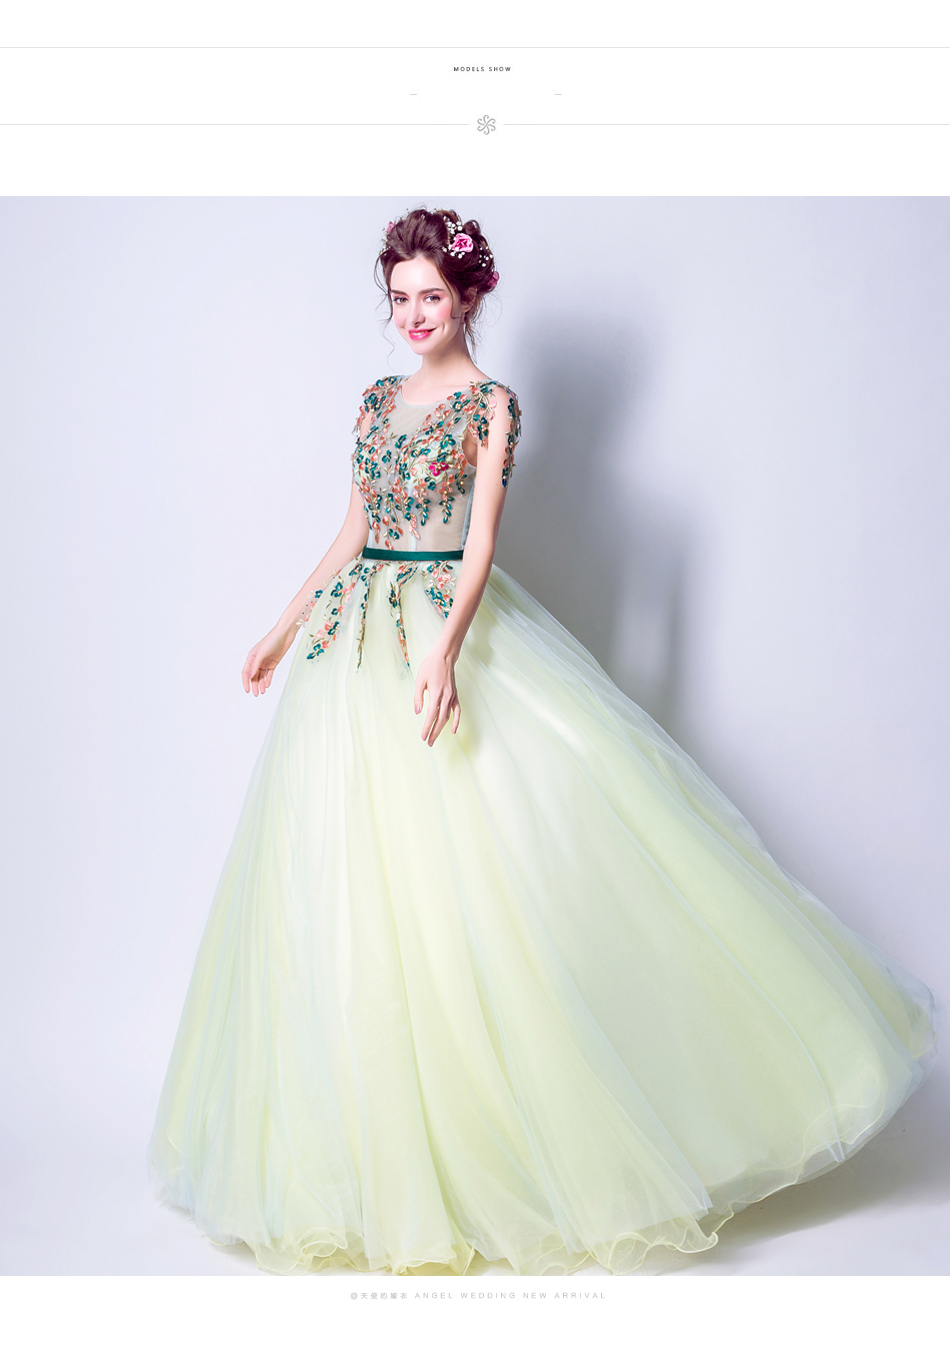 Angel Wedding Dress Marriage Bride Bridal Gown Vestido De Noiva 2017 Green, embroidery, the wizard of Oz 2217 9